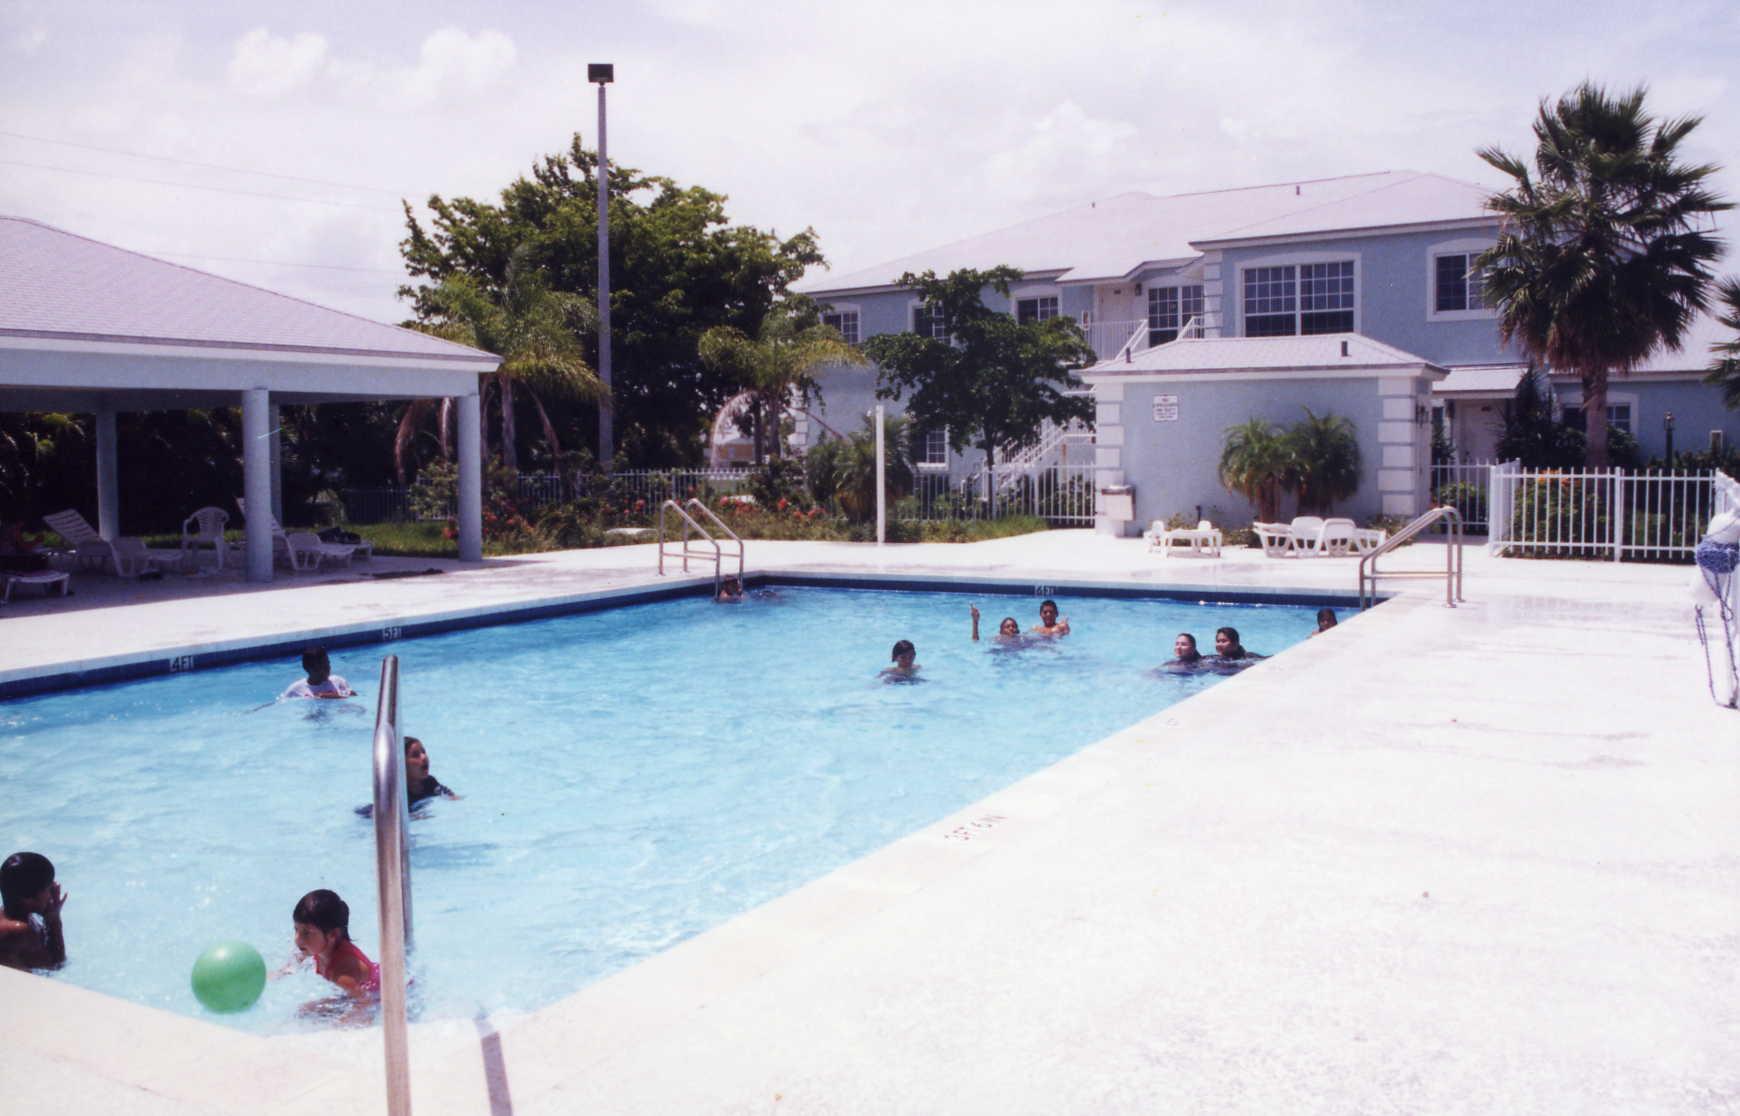 images_PALMVILLAS_PV Pool 2